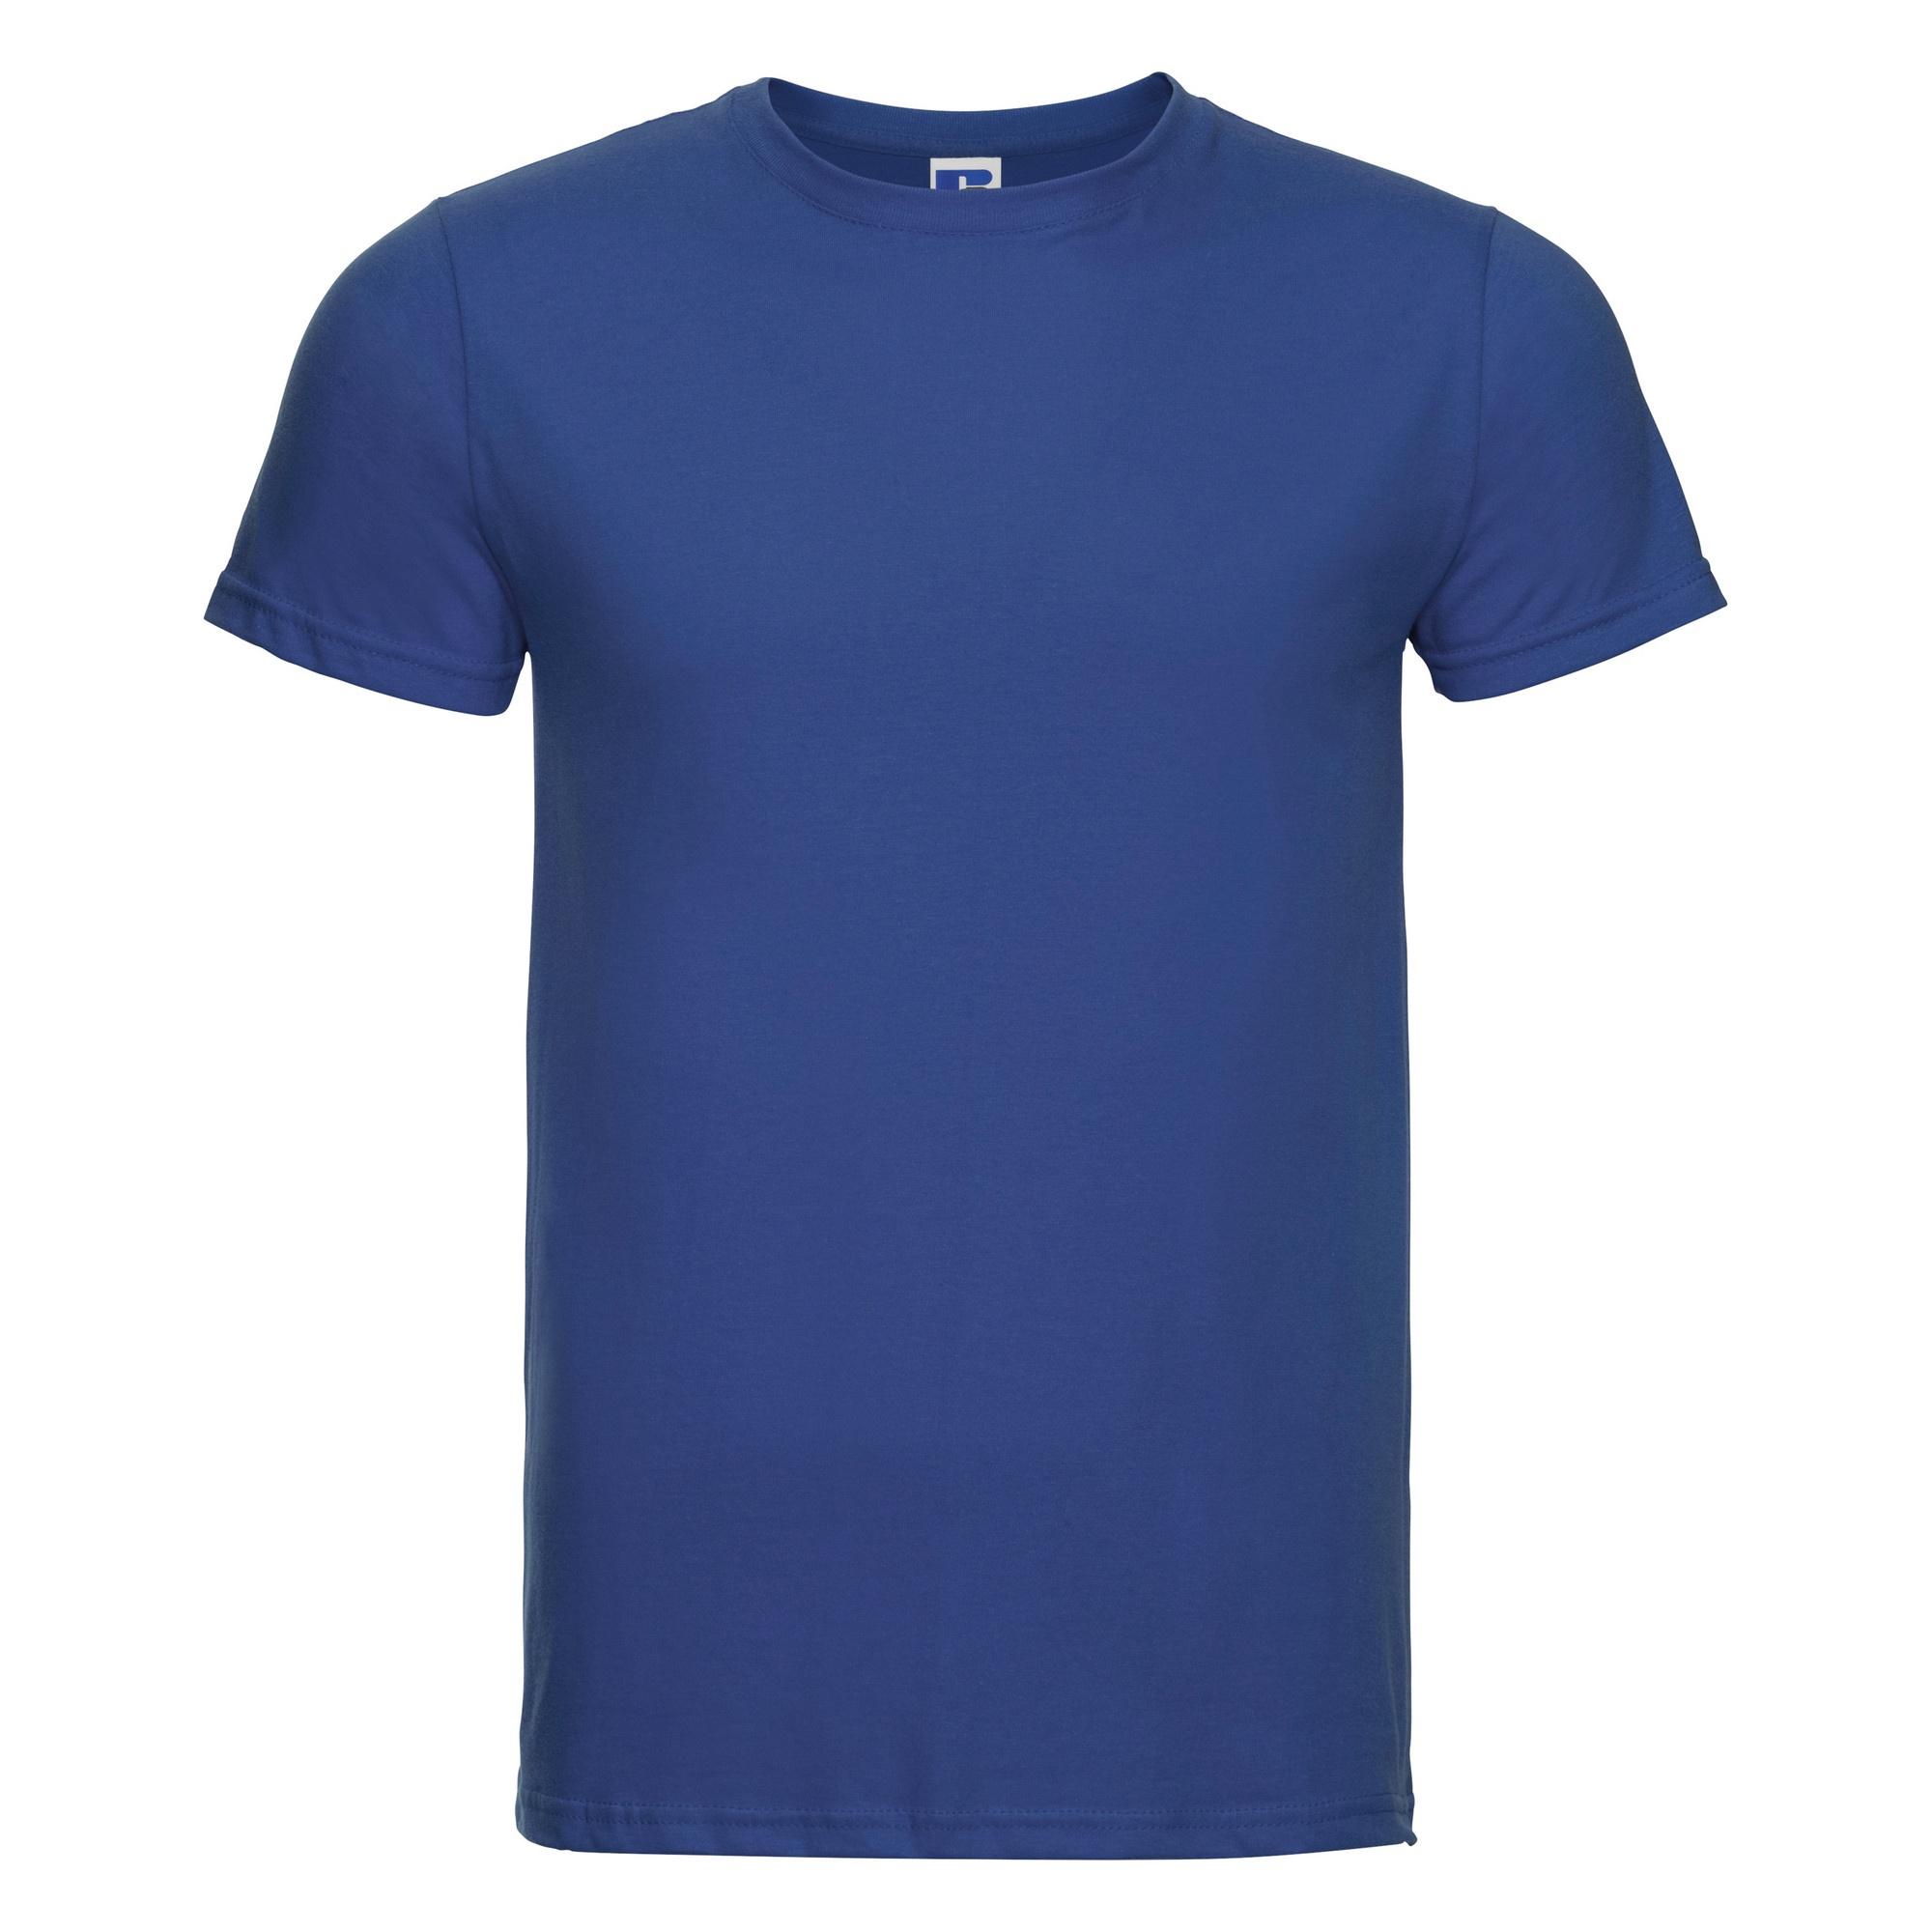 Russell-Mens-Slim-Plain-Blank-100-Cotton-Short-Sleeve-T-Shirt-Tee-BC1515 thumbnail 22